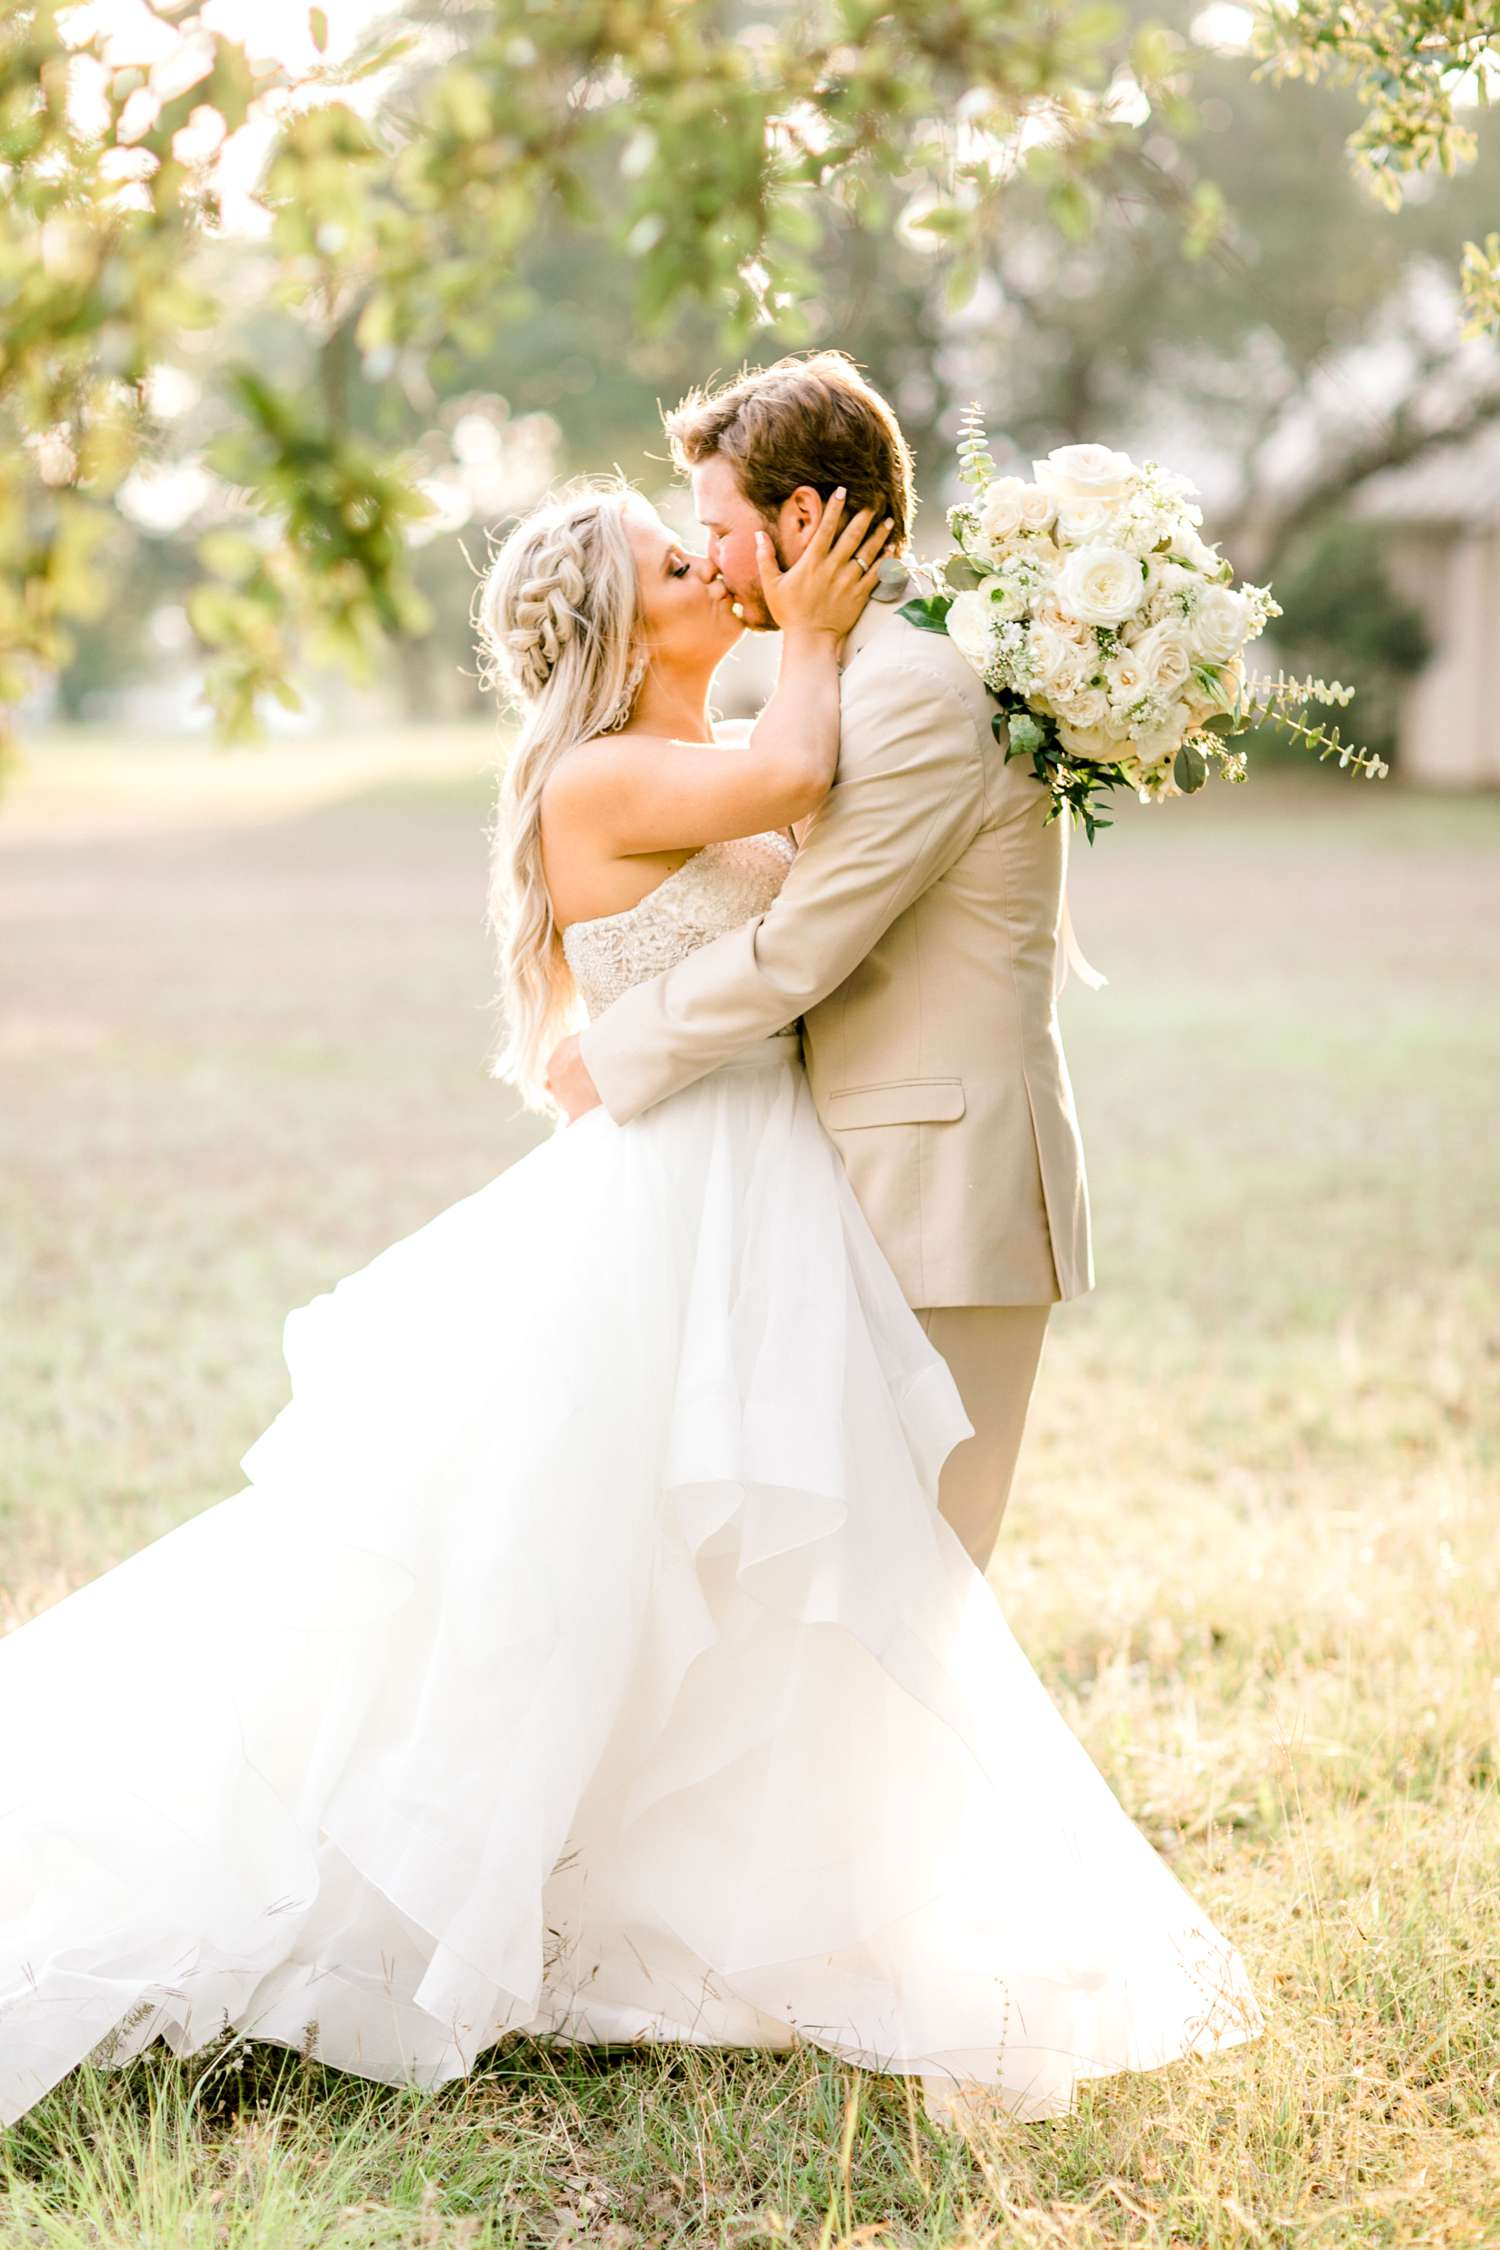 HAYLEE+JUSTIN+GREGORY+HERITAGE_HAUS_AUSTIN_TEXAS_WEDDING_0119.jpg